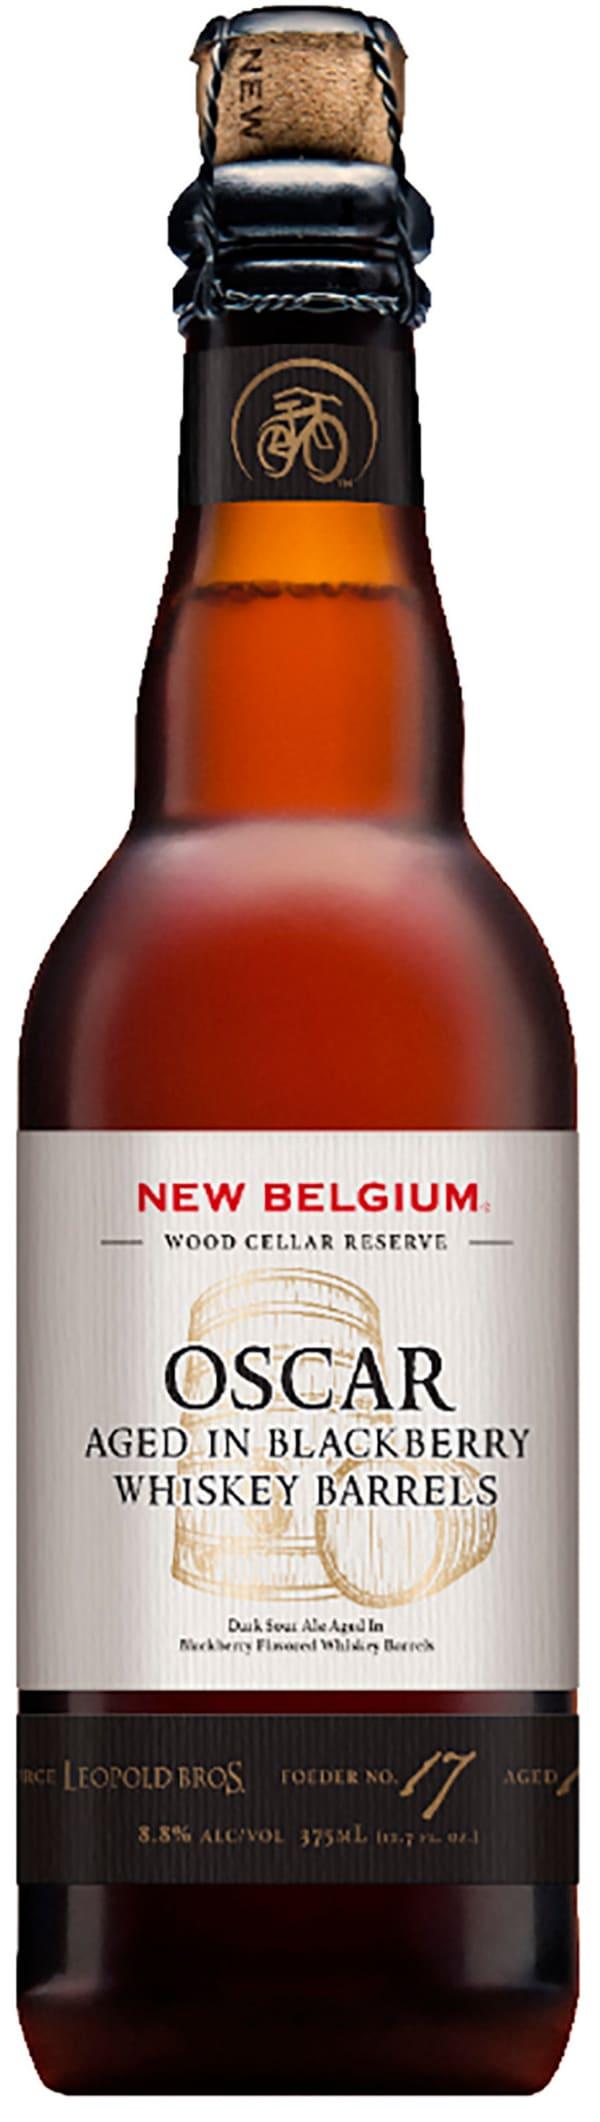 New Belgium Oscar Aged in Blackberry Whiskey Barrels